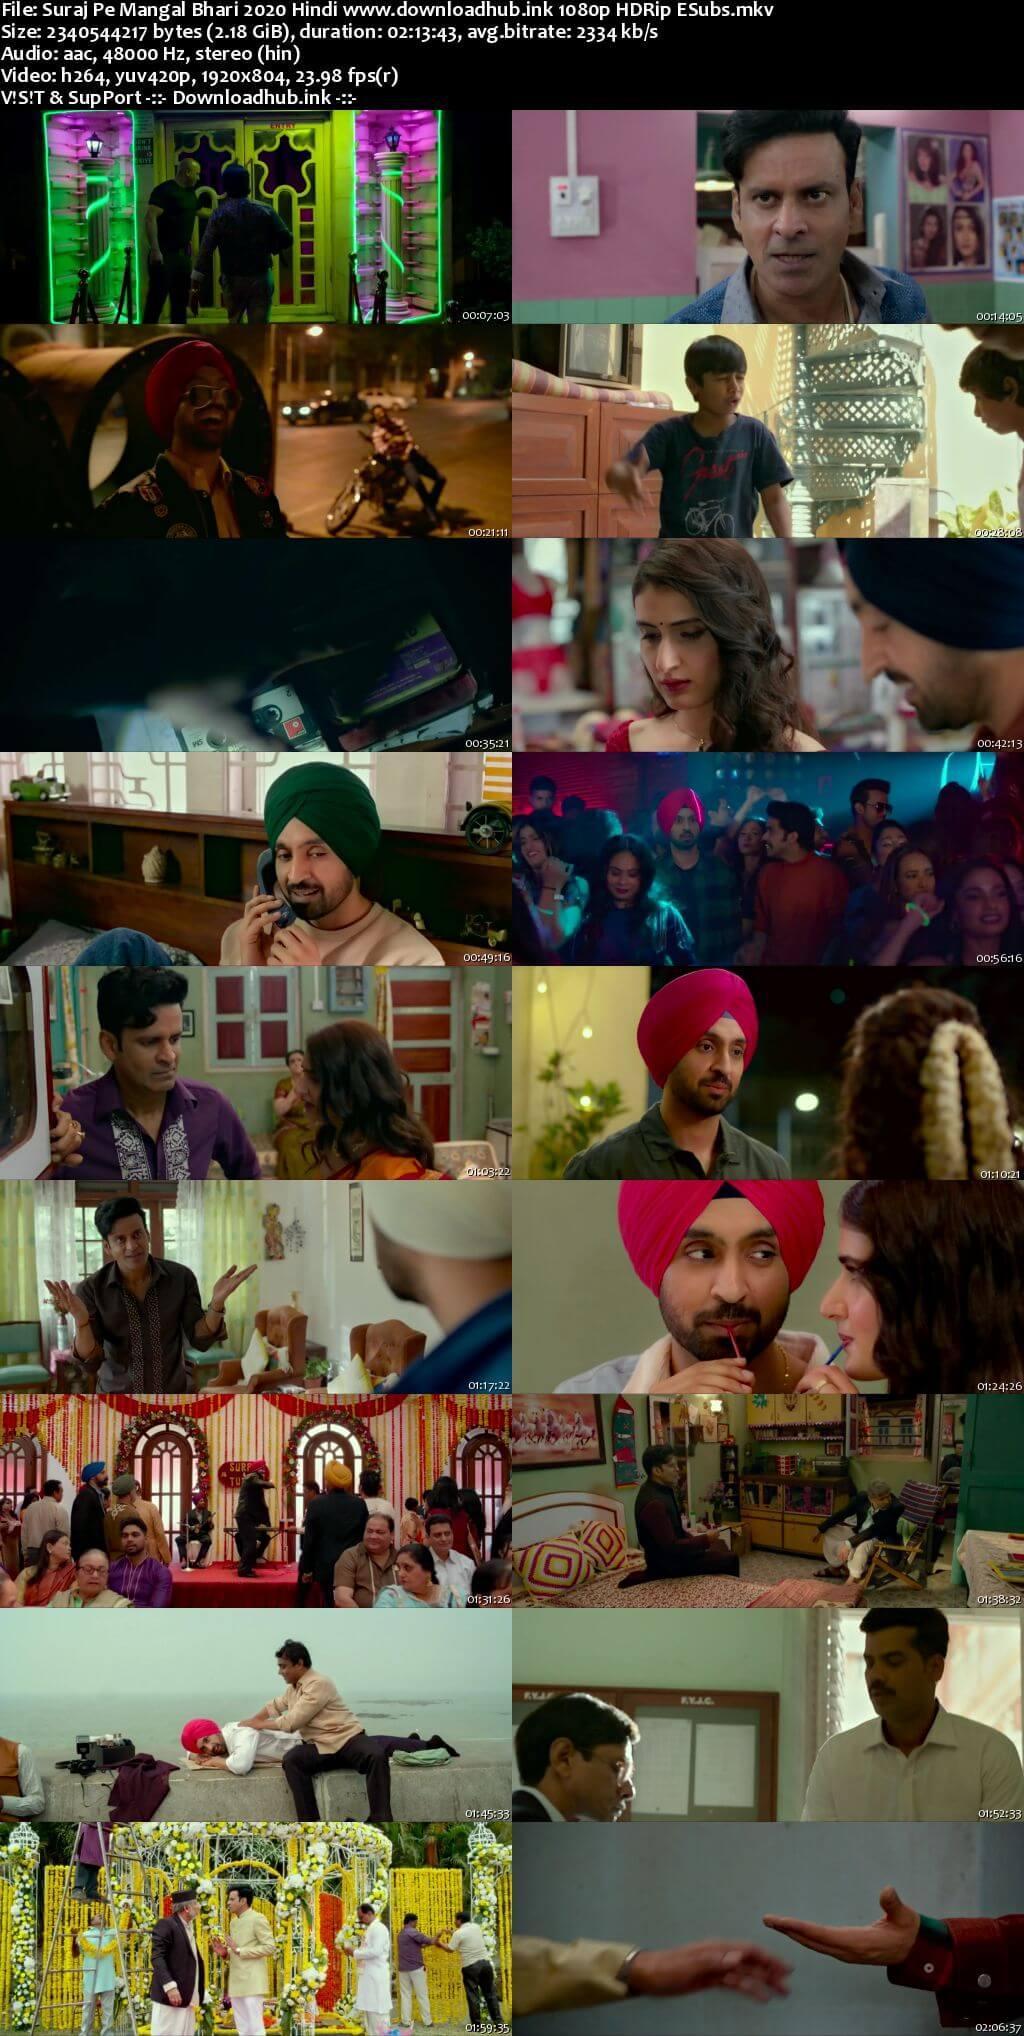 Suraj Pe Mangal Bhari 2020 Hindi 1080p HDRip ESubs